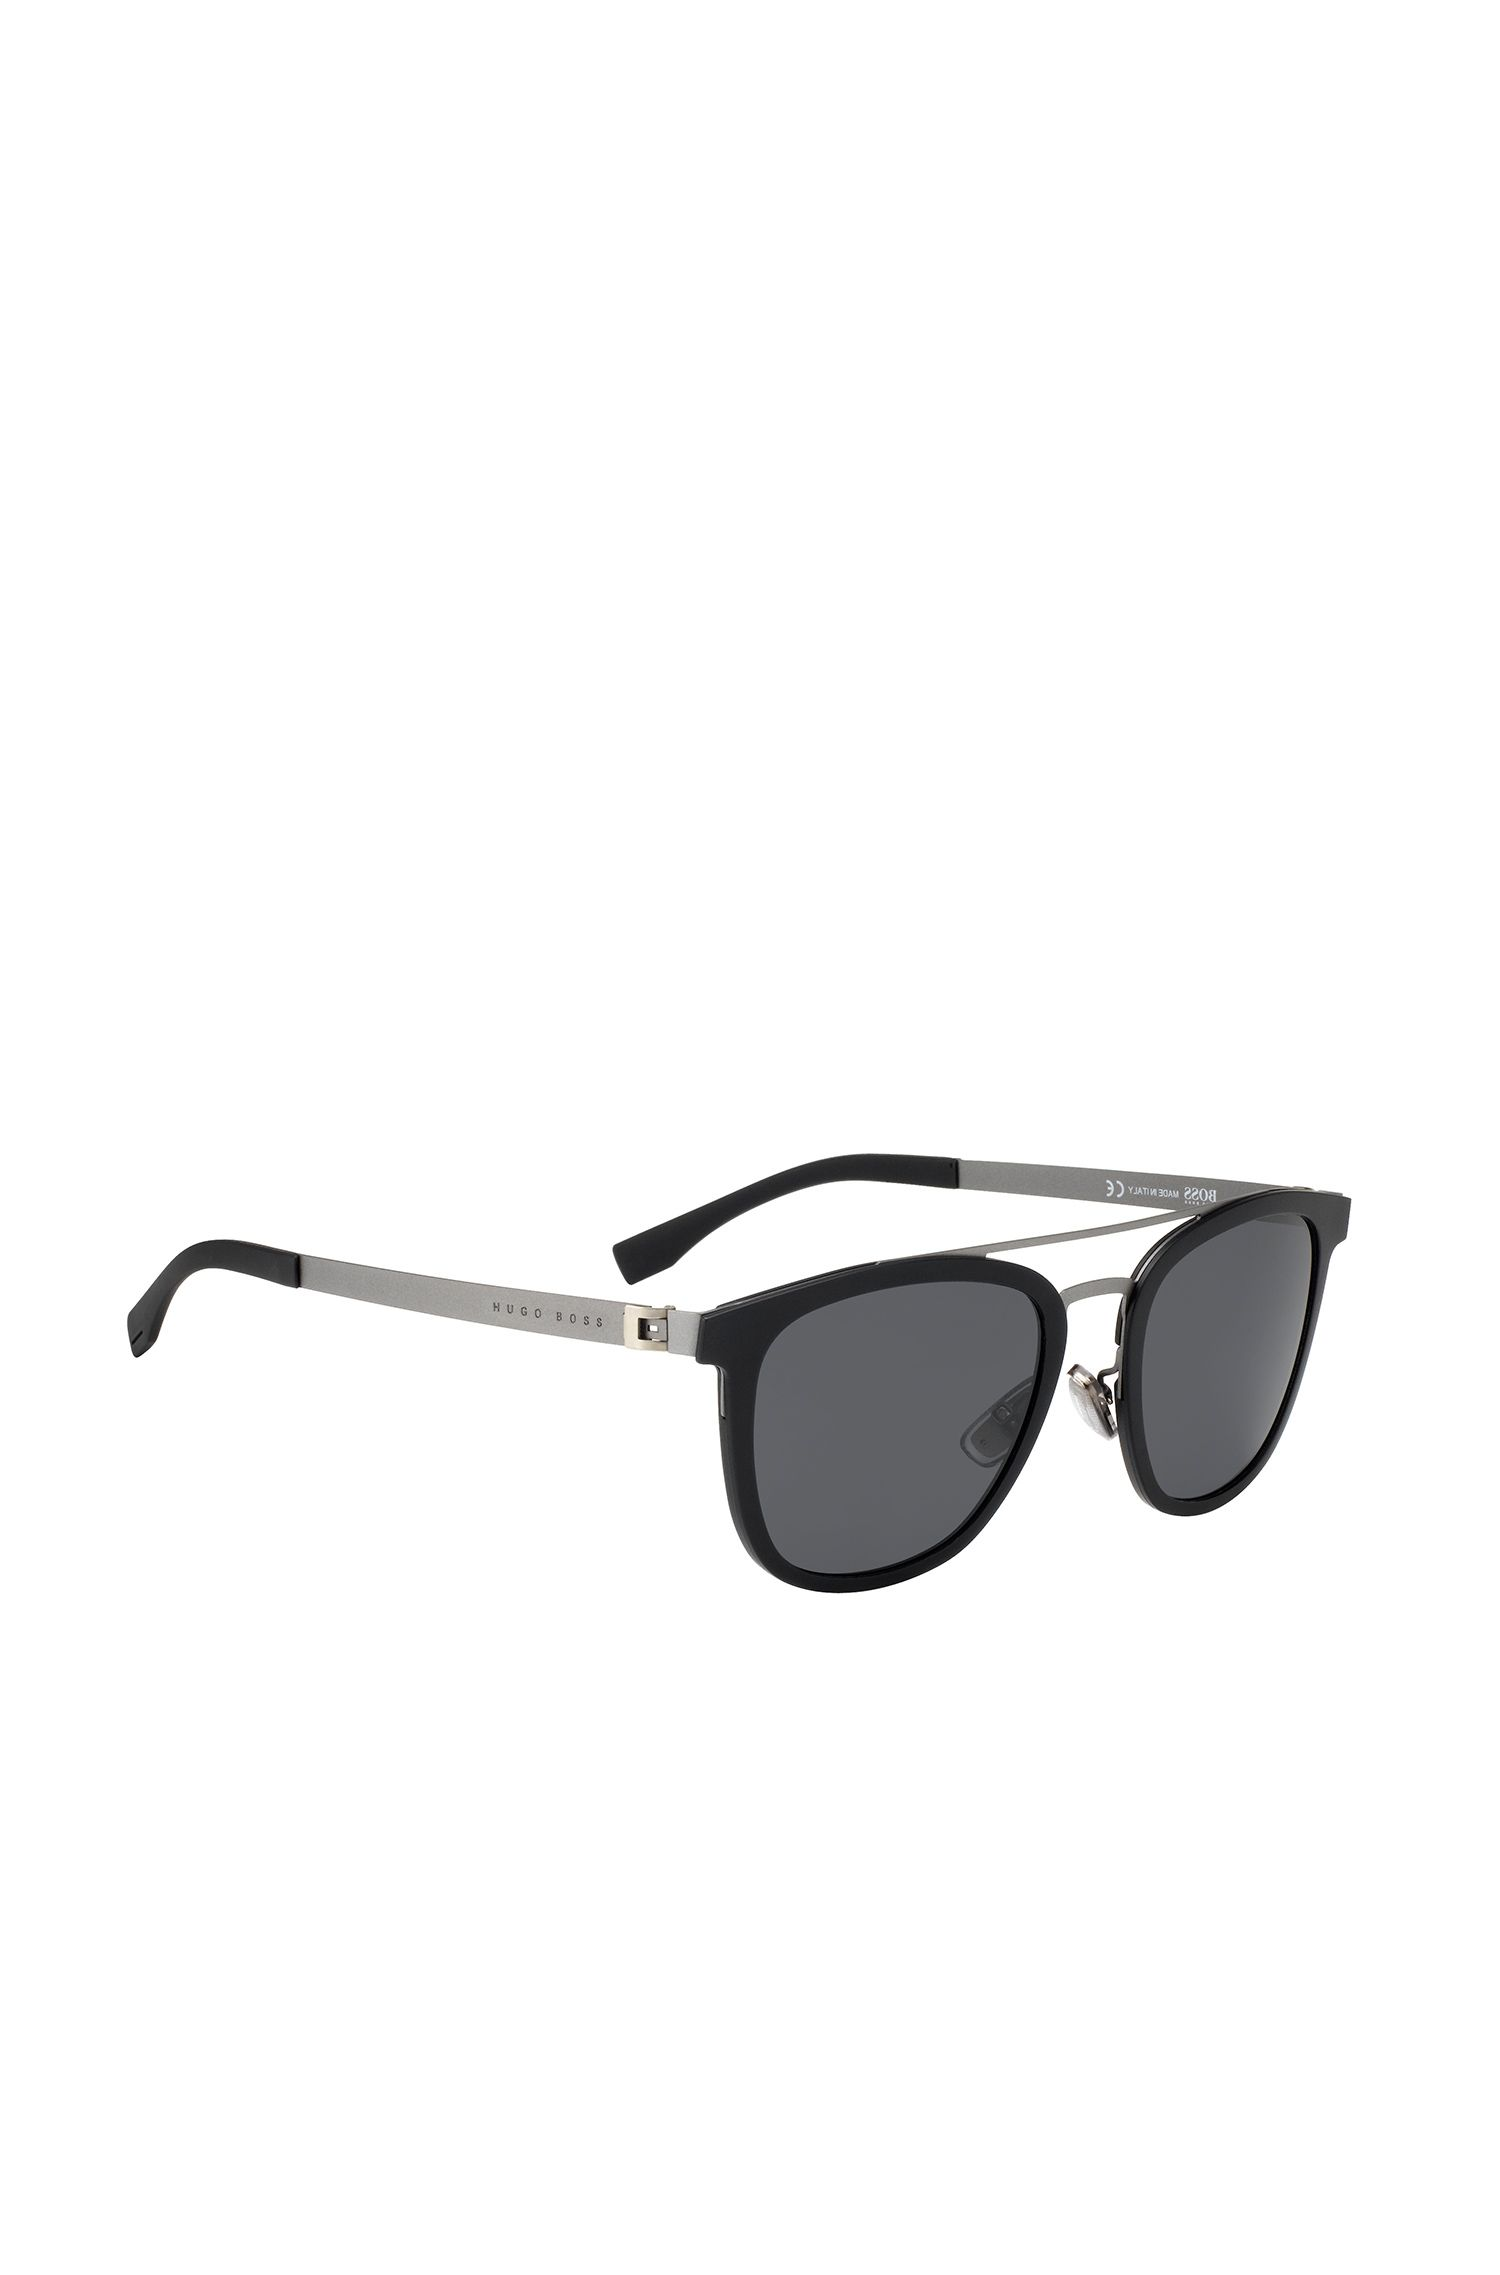 'BOSS 0838S' | Acetate Stainless Steel Round Sunglasses